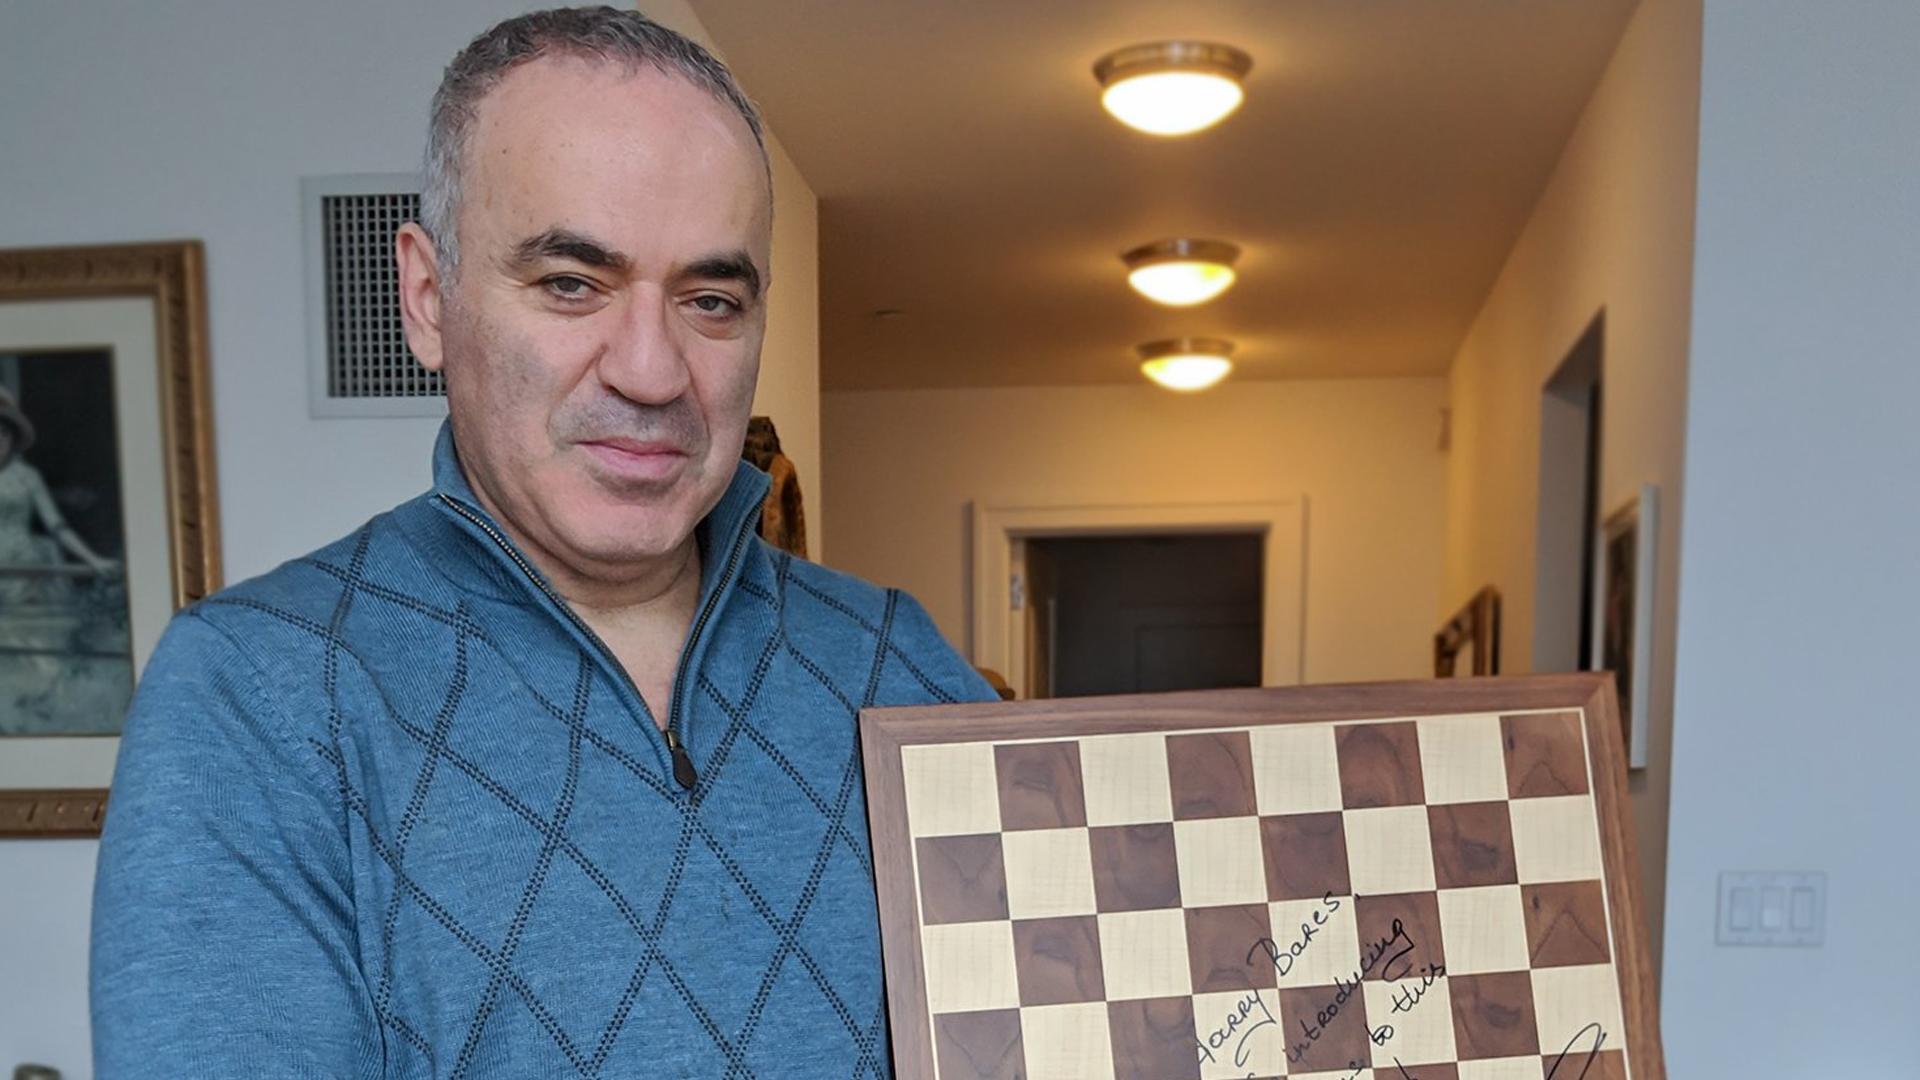 Garry Kasparov Twitter Image